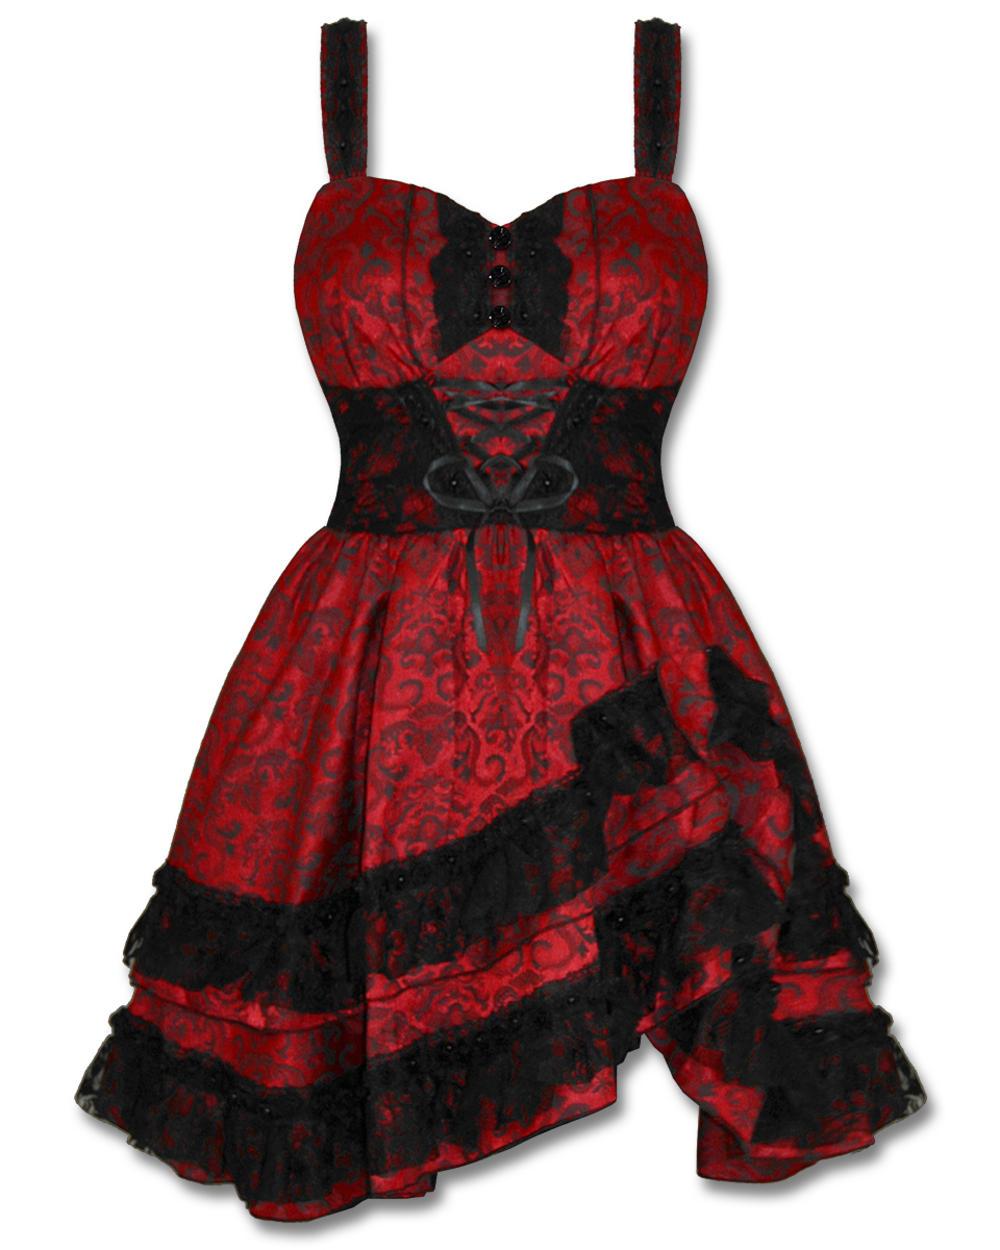 girls's dresses halifax